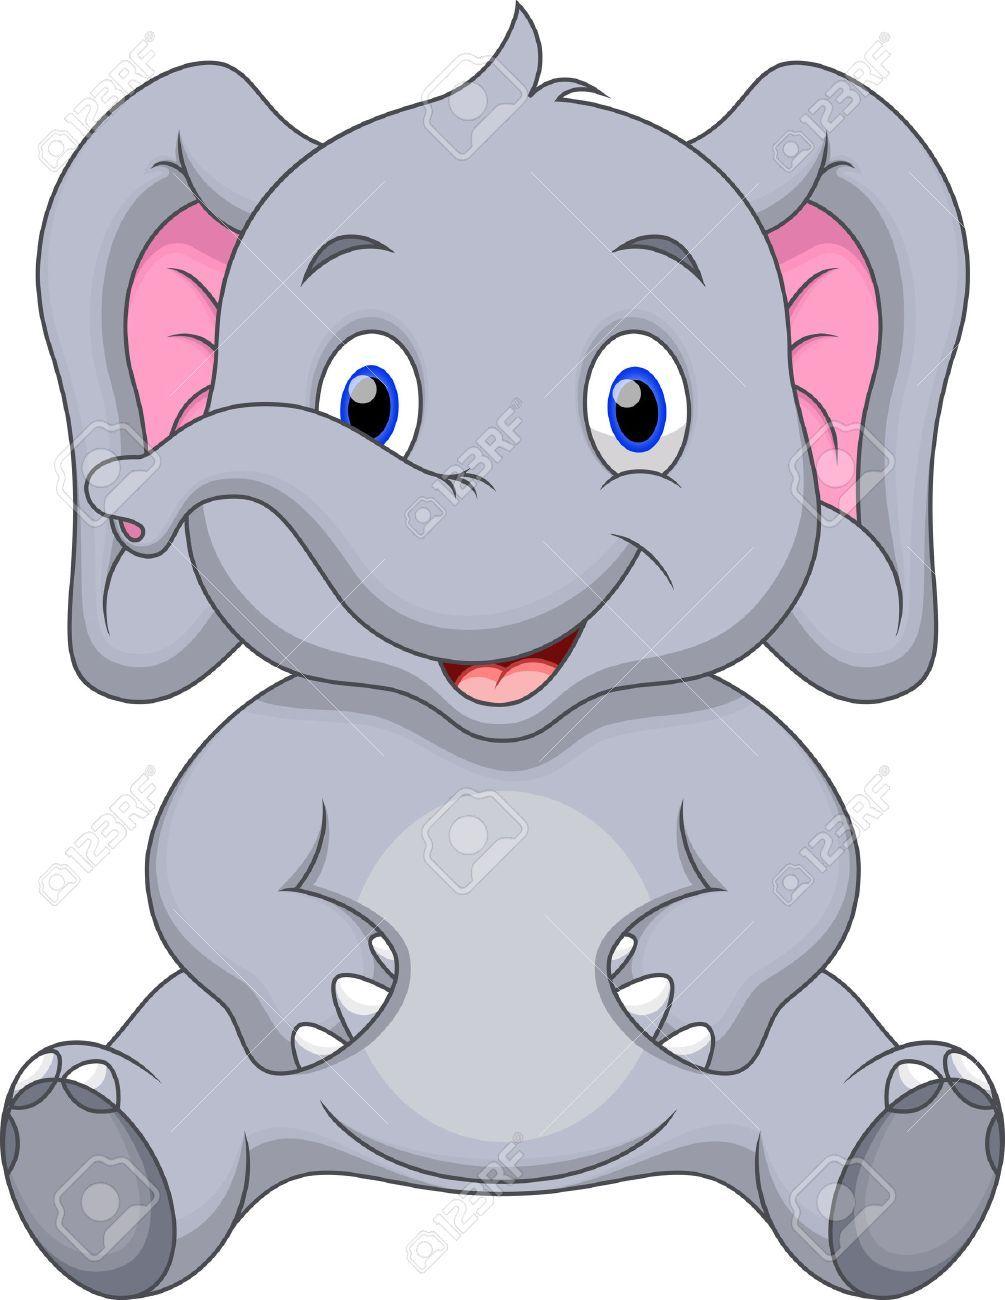 Dibujos Animados Lindo Elefante Dibujo Elefante Infantil Imagenes Infantiles De Animales Elefante Infantil